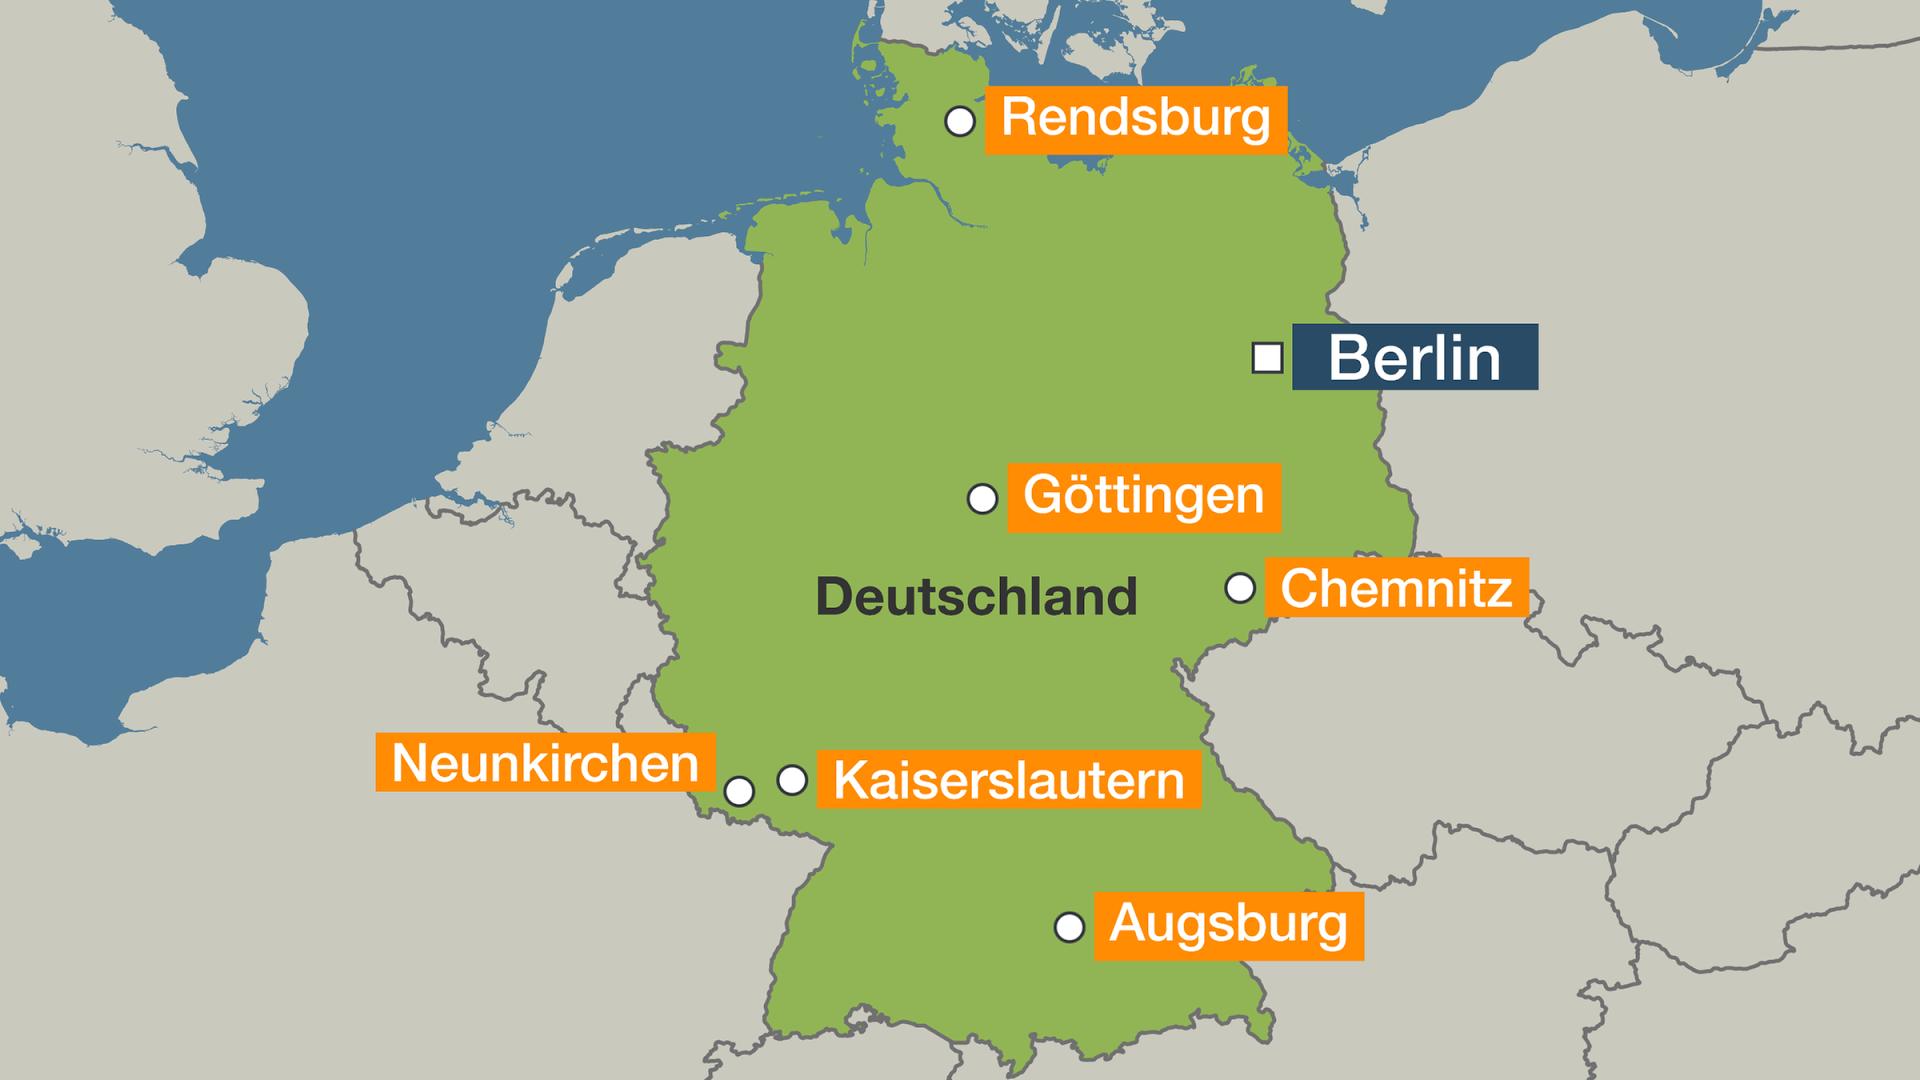 Mehrere Rathäuser in Deutschland geräumt wegen Drohung